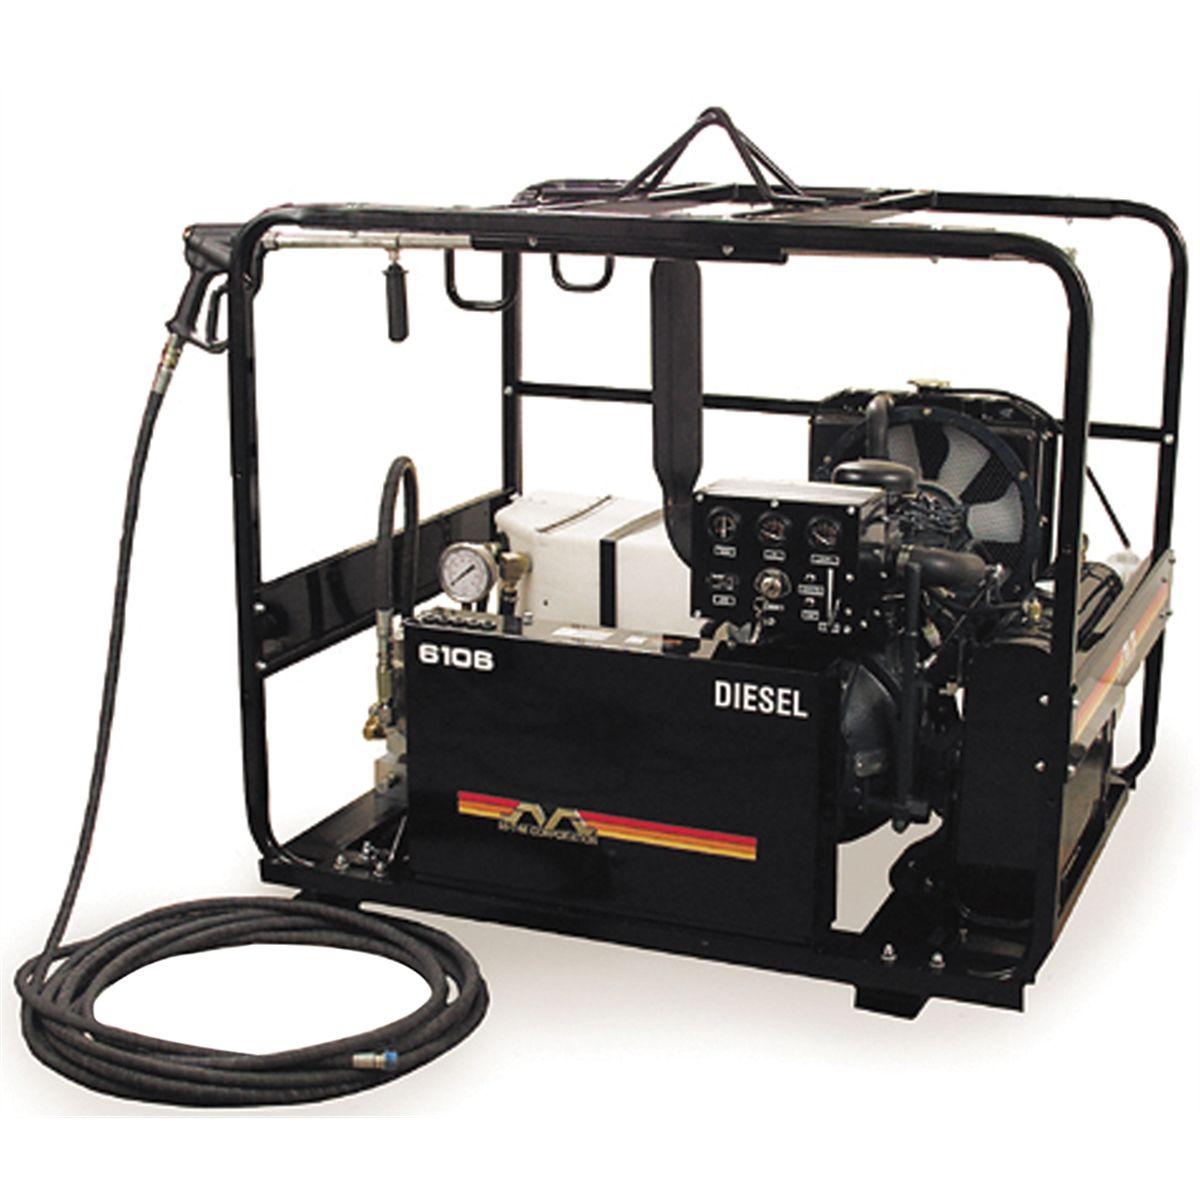 Kubota Diesel Cold Water Pressure Washer, 6100 PSI @ 6 3 GPM